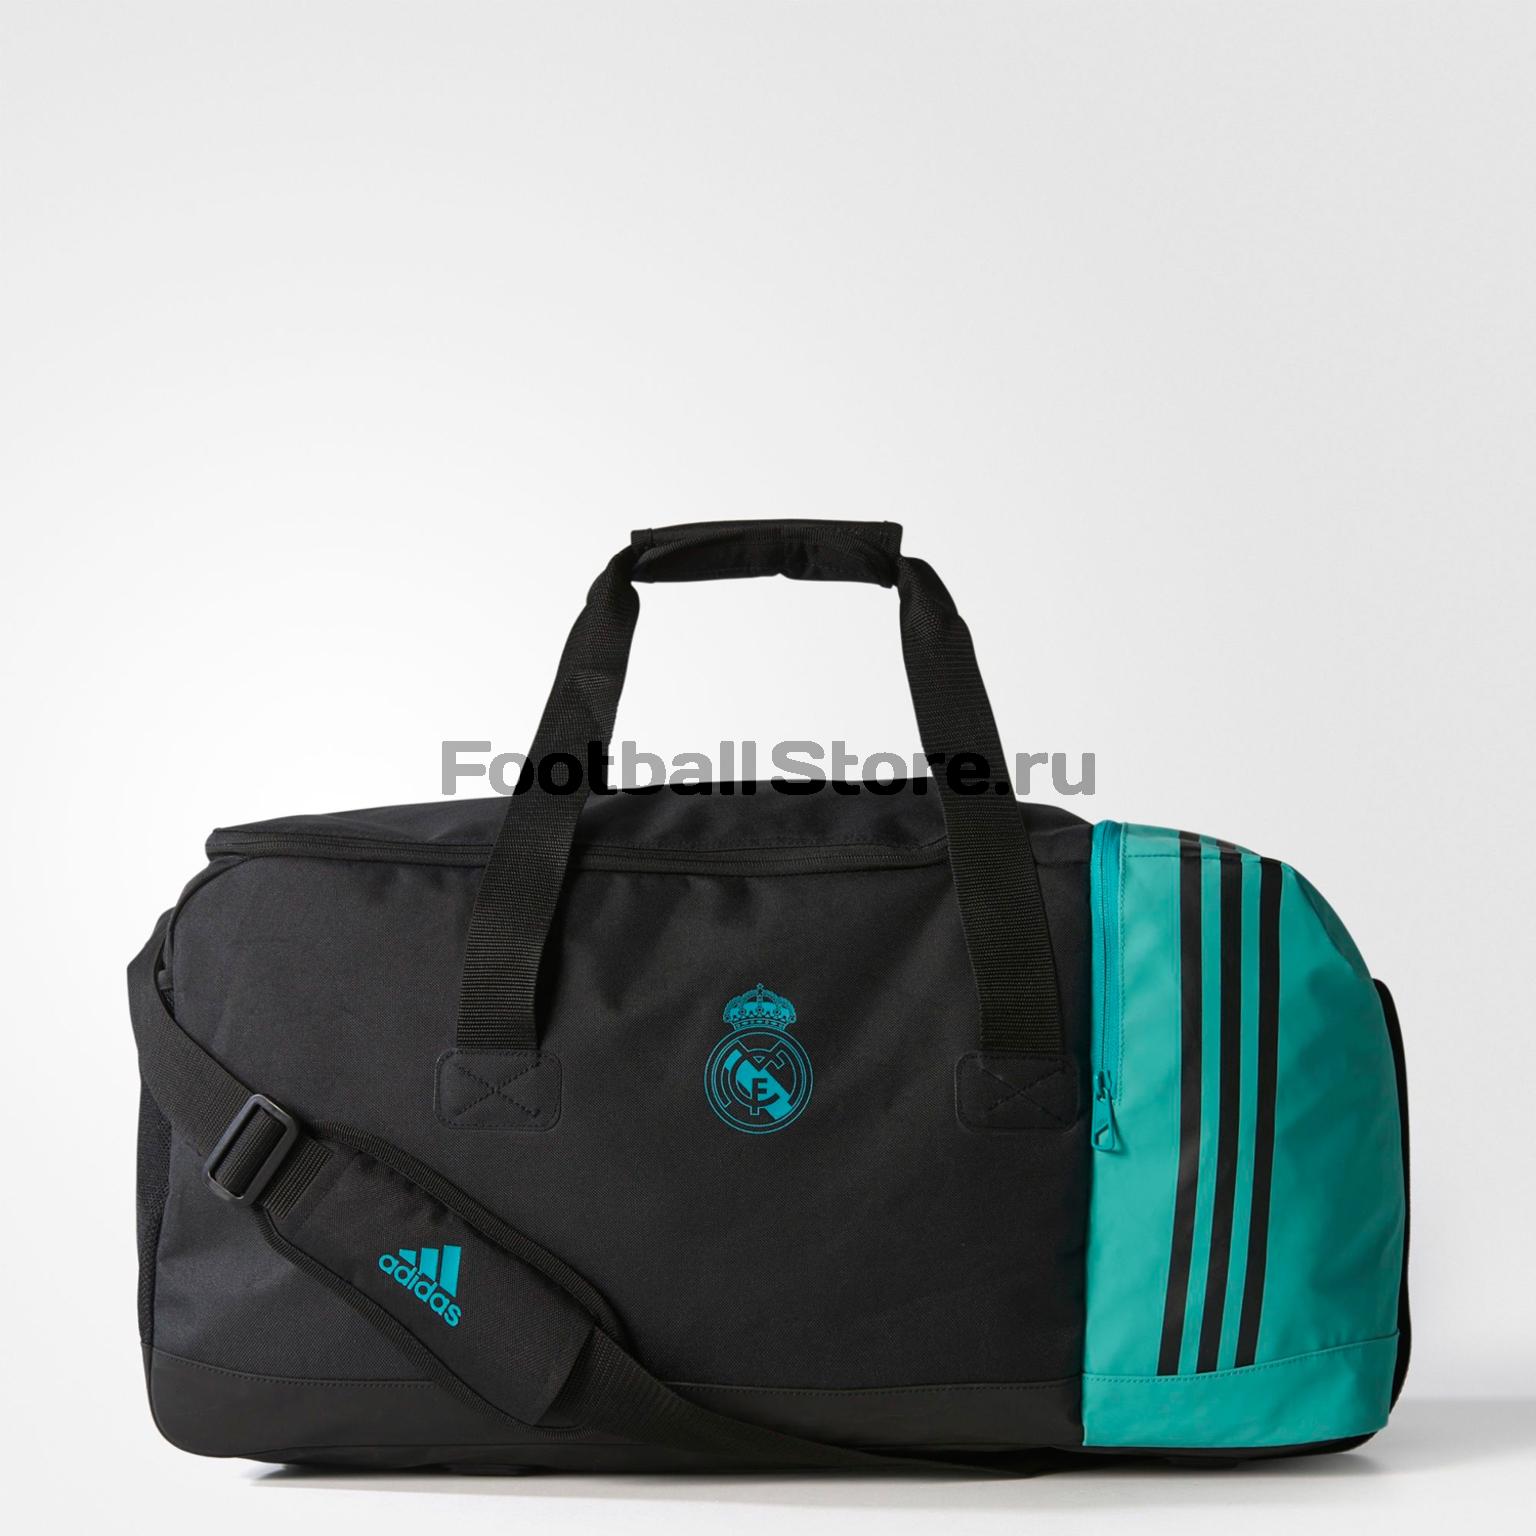 Real Madrid Adidas Сумка Adidas Real Madrid Teambag M BR7148 tryp madrid centro ex tryp washington 3 мадрид